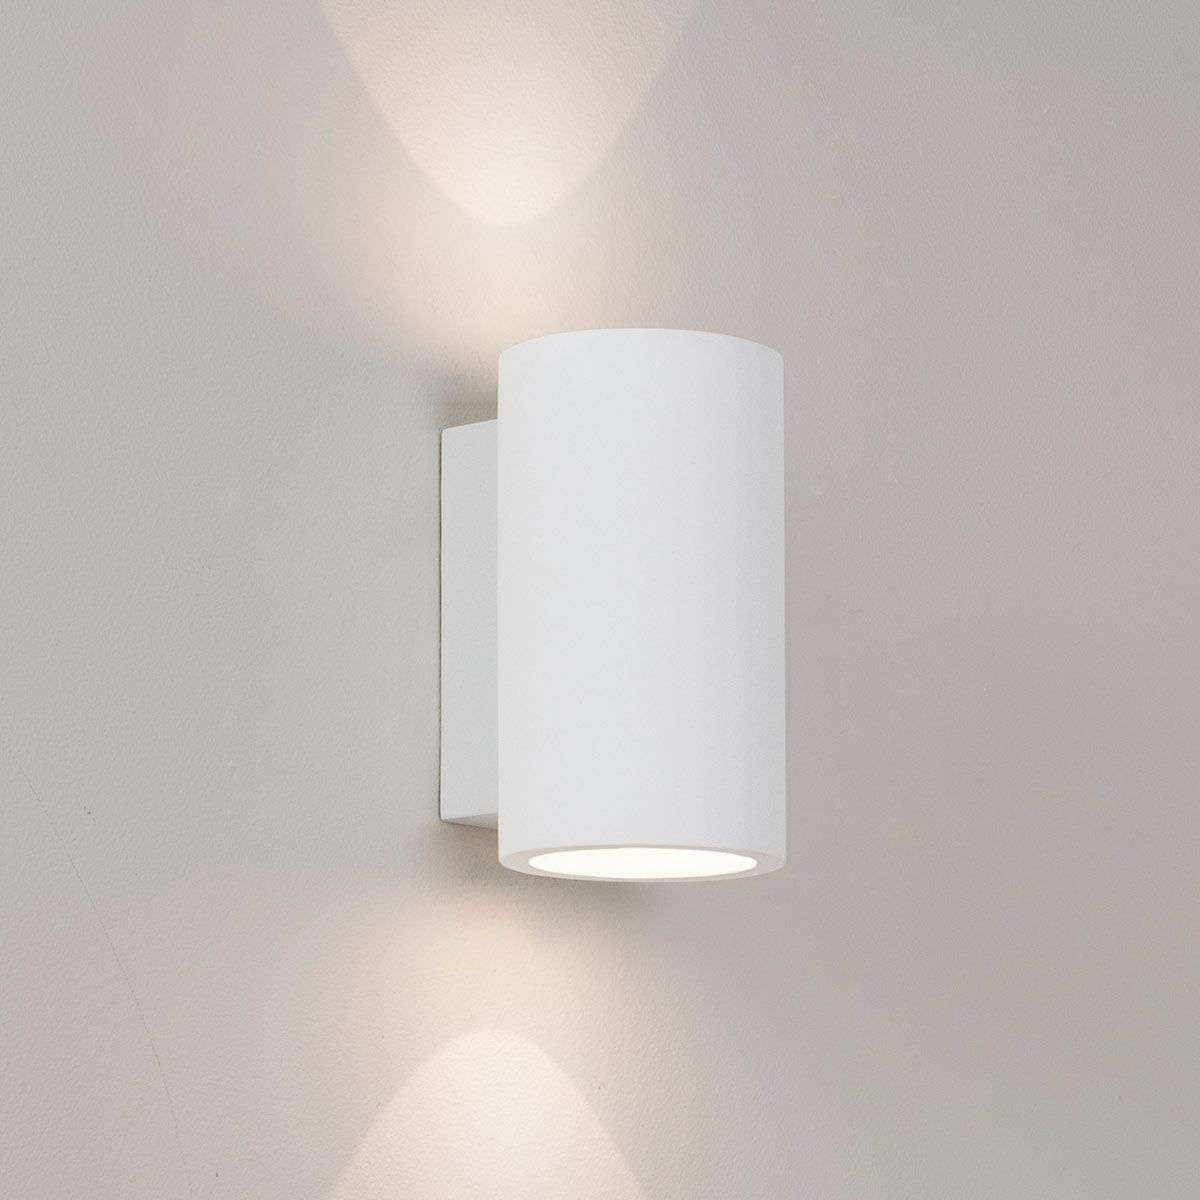 Bologna 160 LED Wall Light White-1020397-32